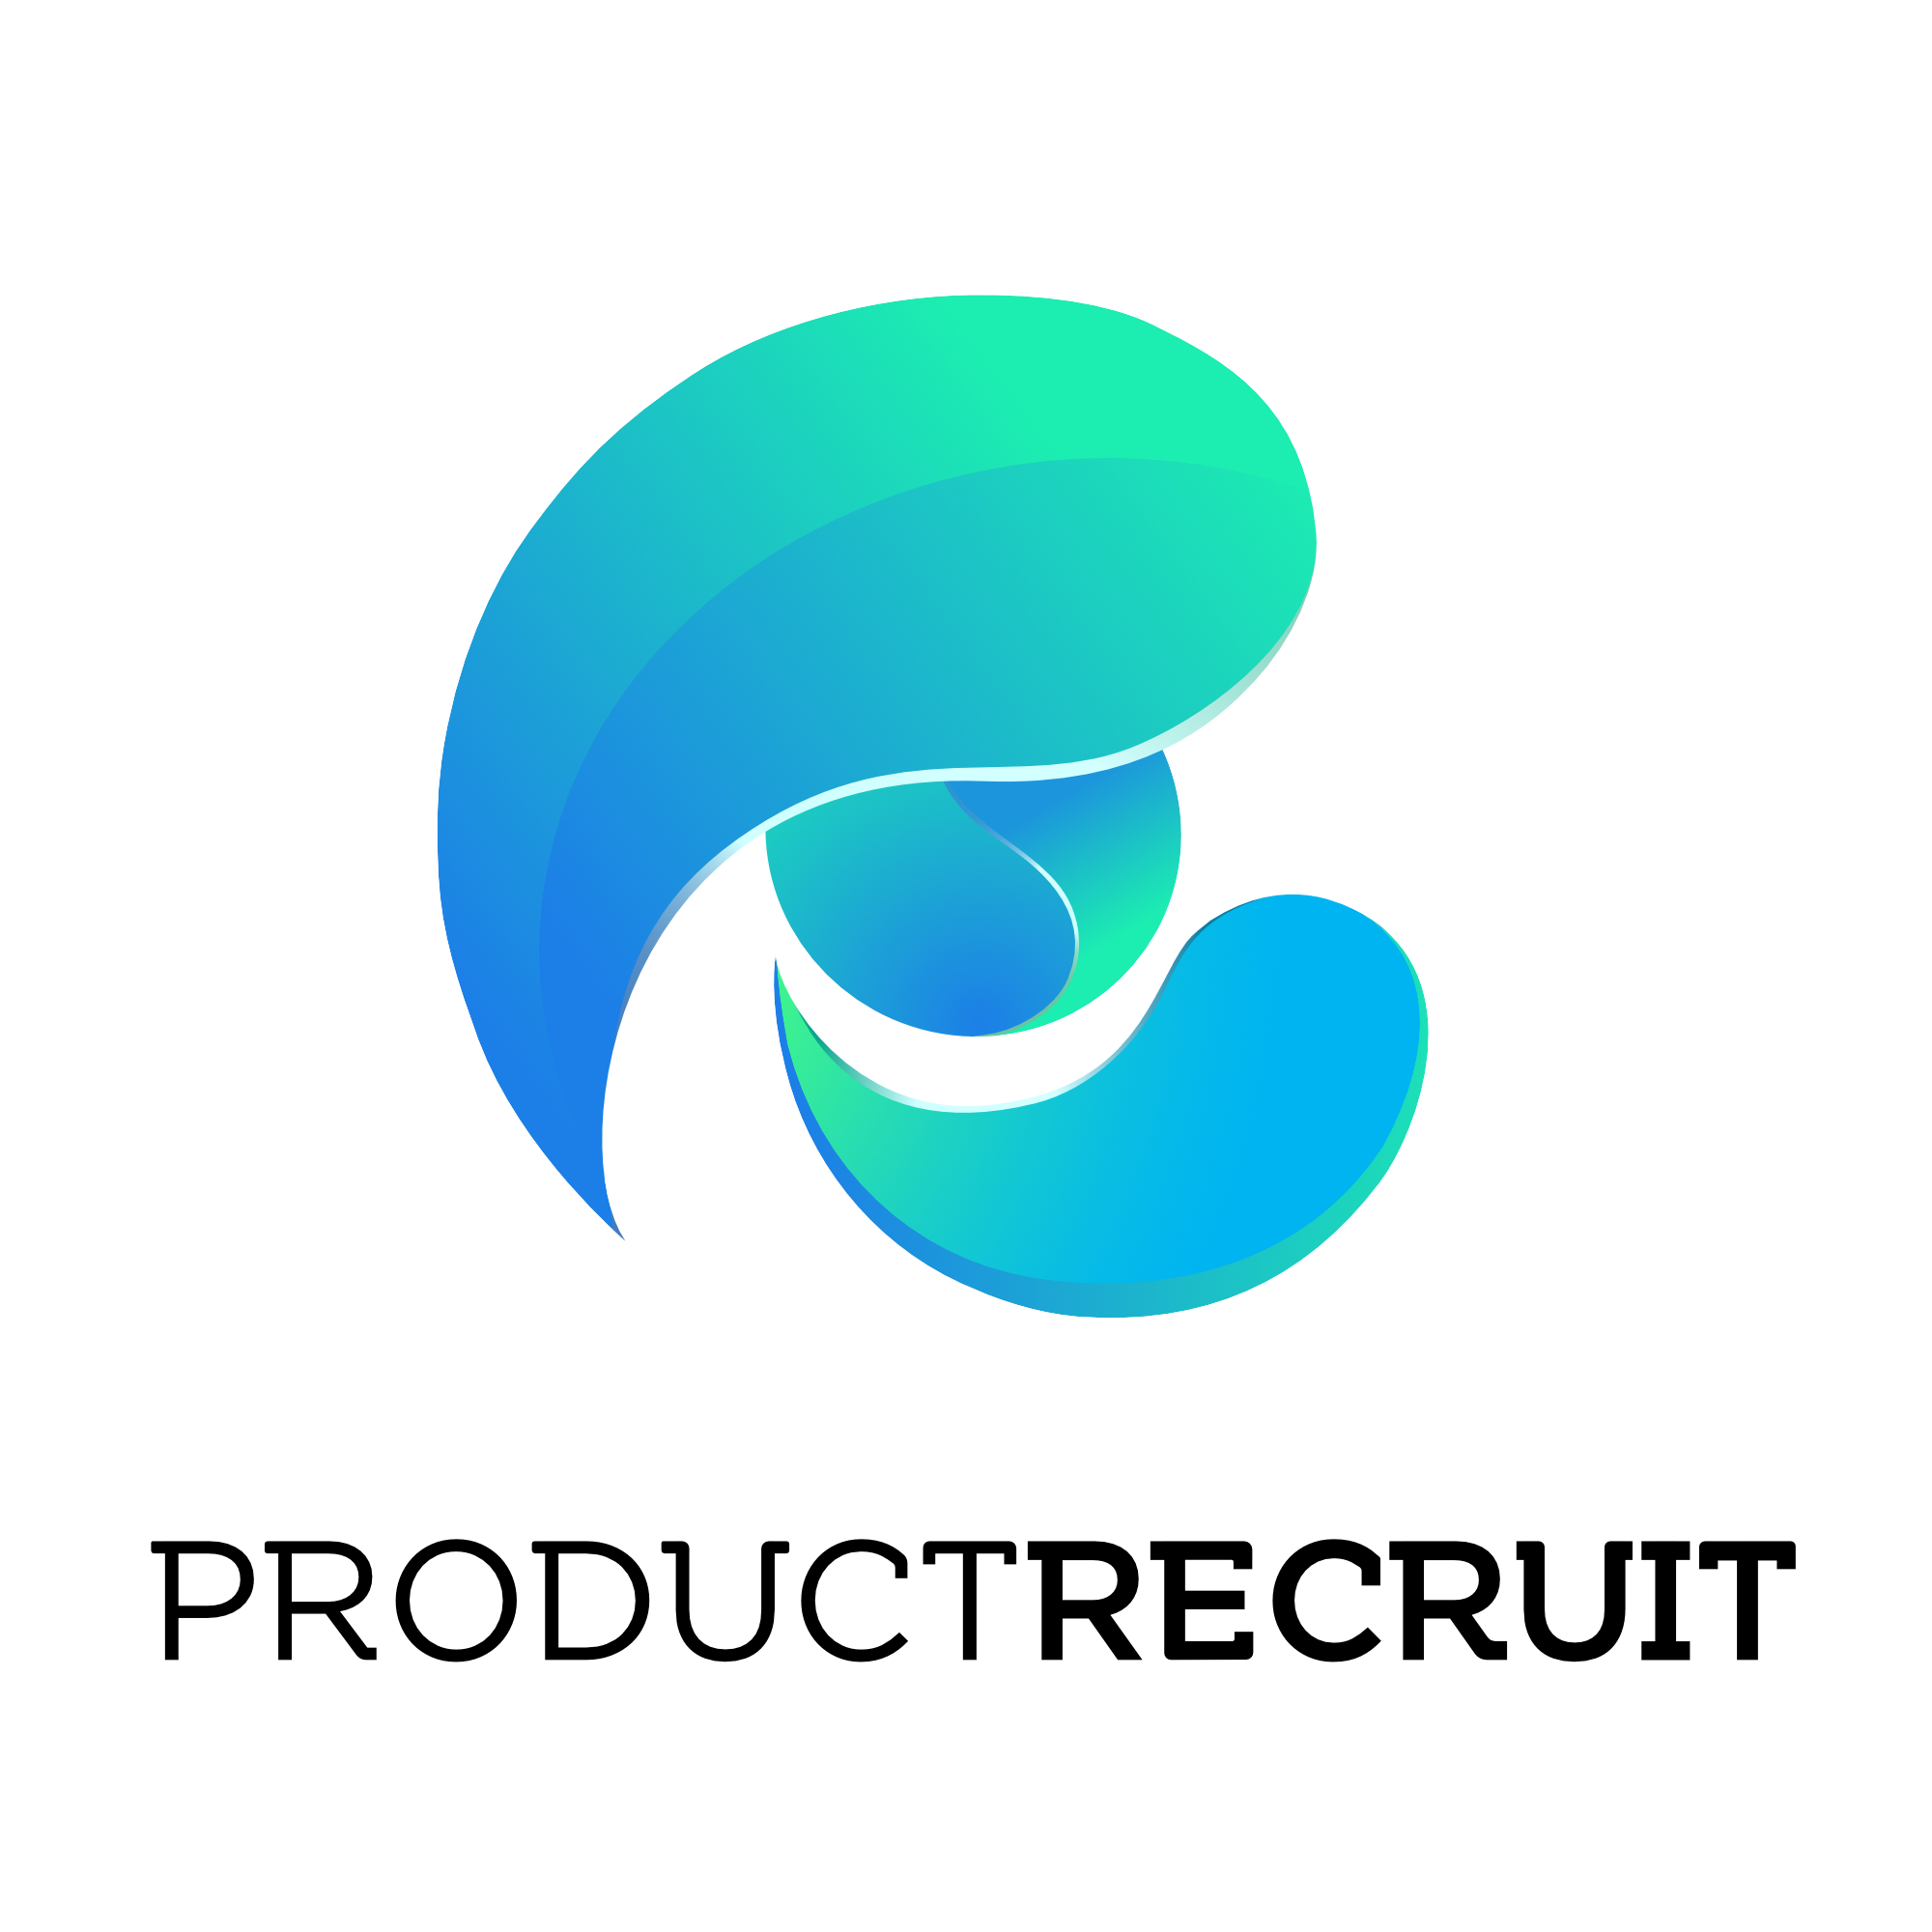 Design a minimalist, clean and smart logo for e-commerce company.